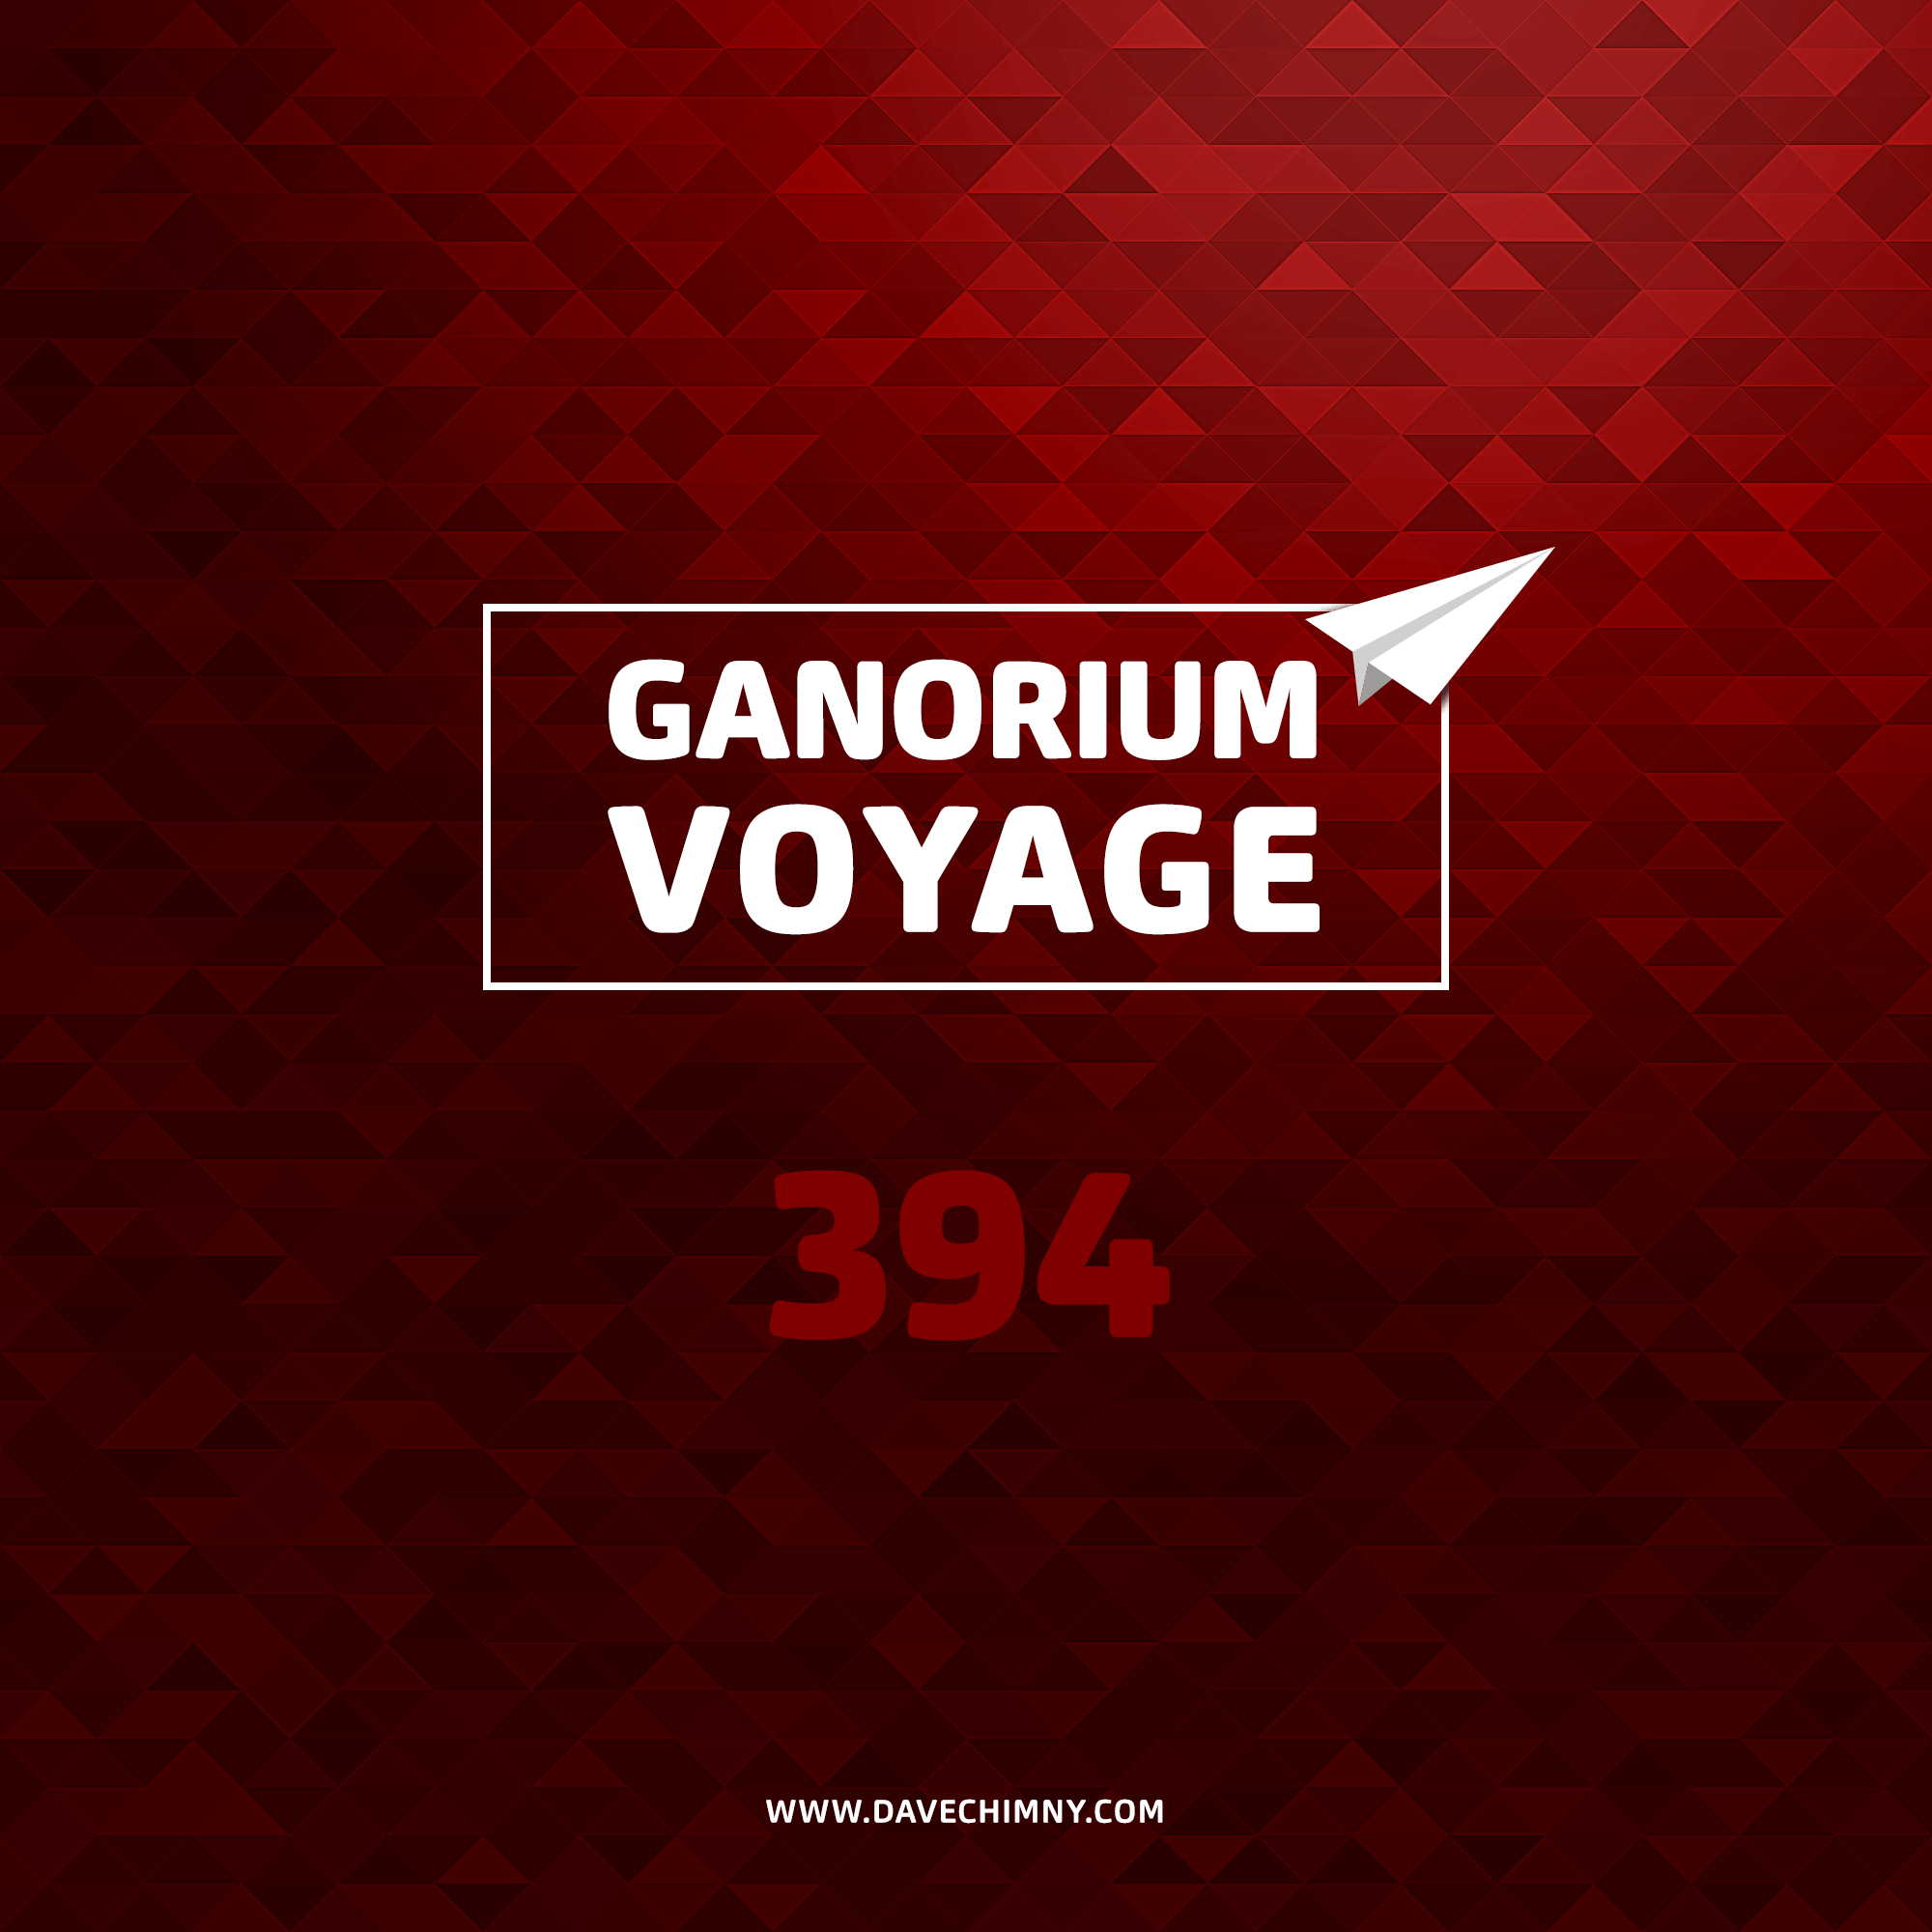 Dave Chimny - Ganorium Voyage 394